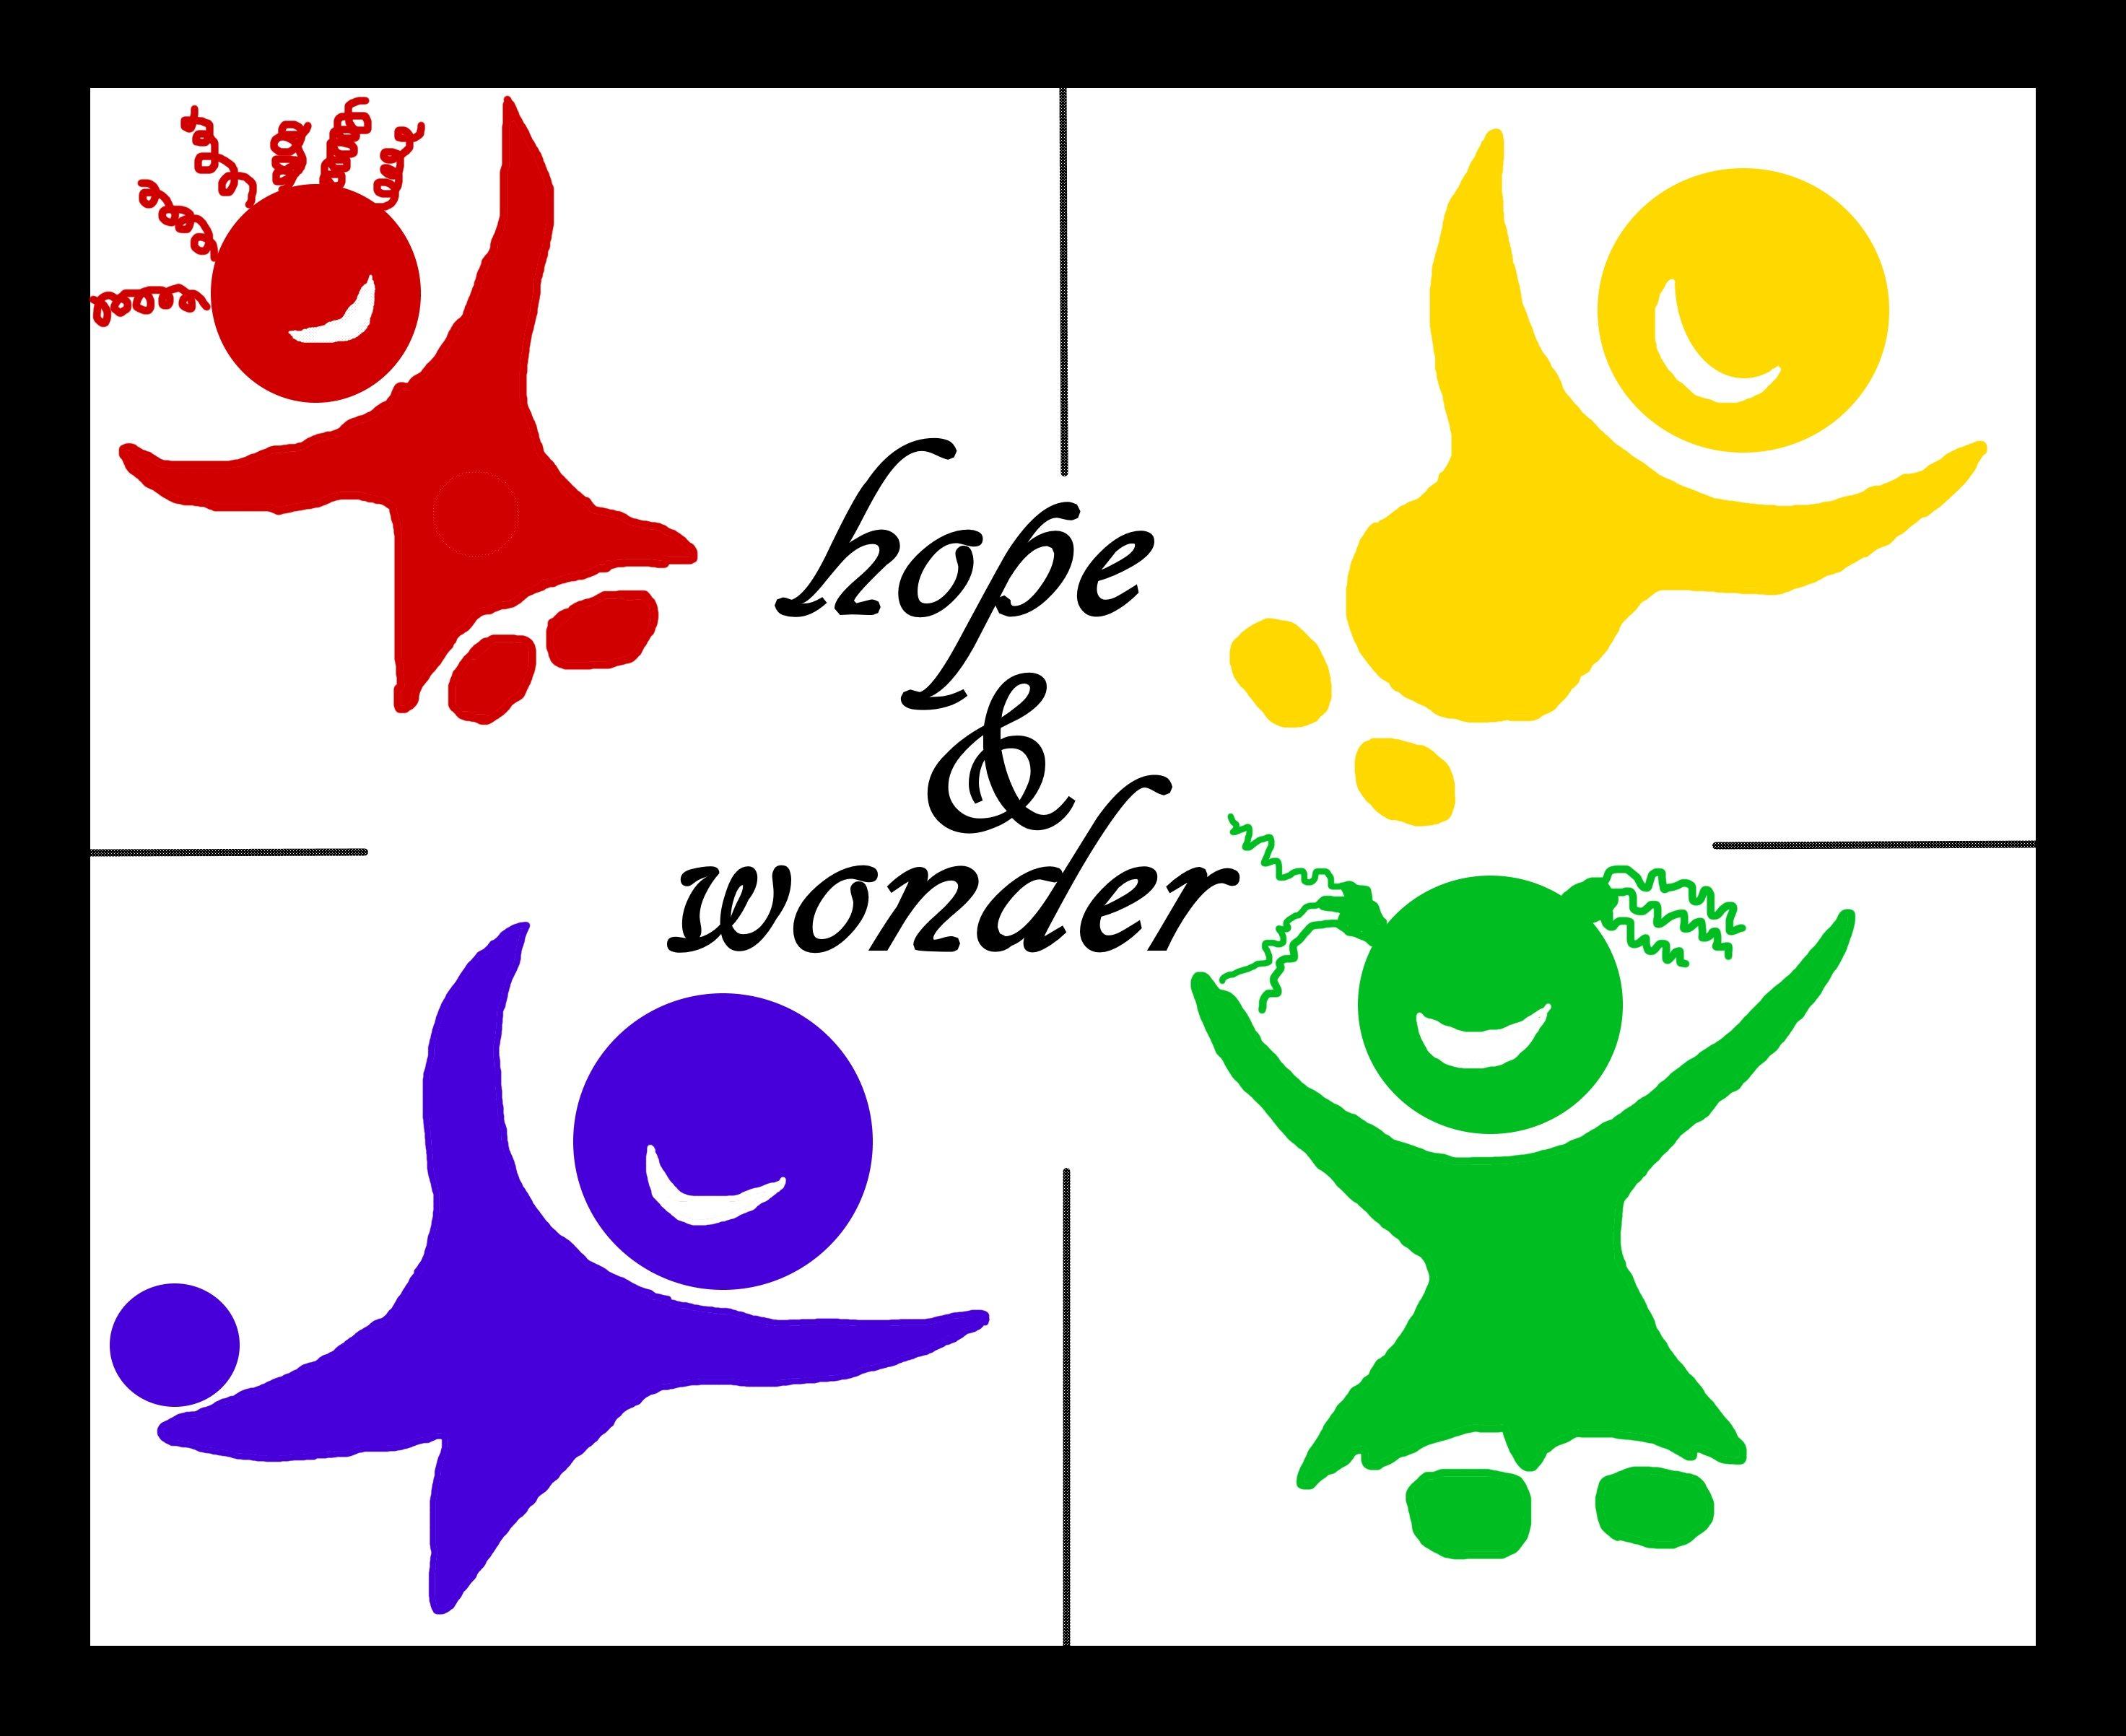 HOPE & WONDER